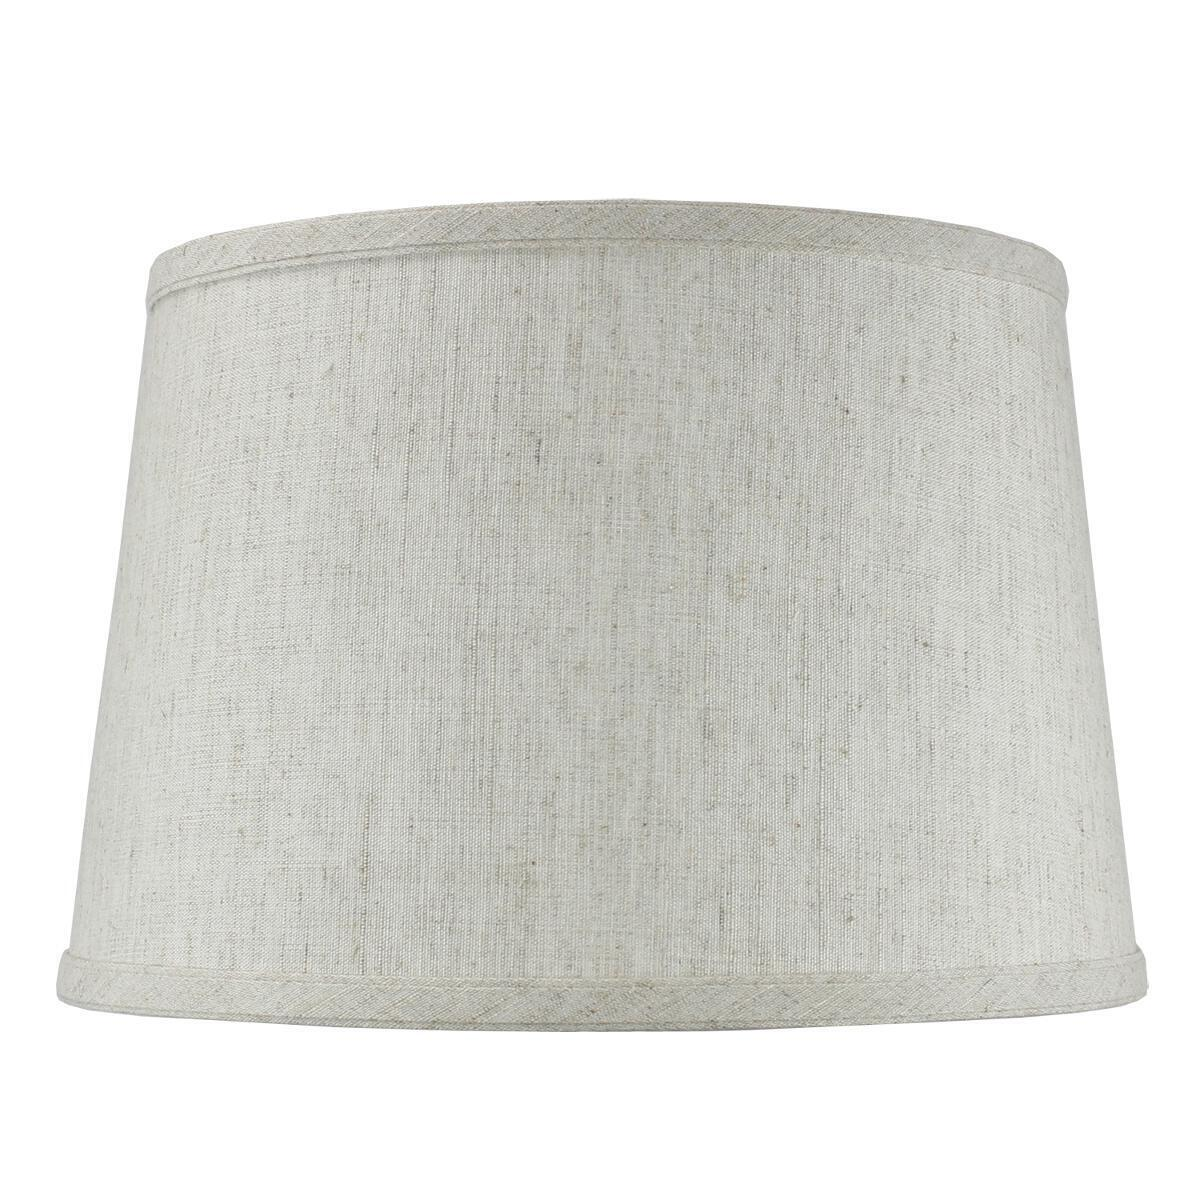 Hardback Shallow Drum Lamp Shade 10x12x8 Textured 0